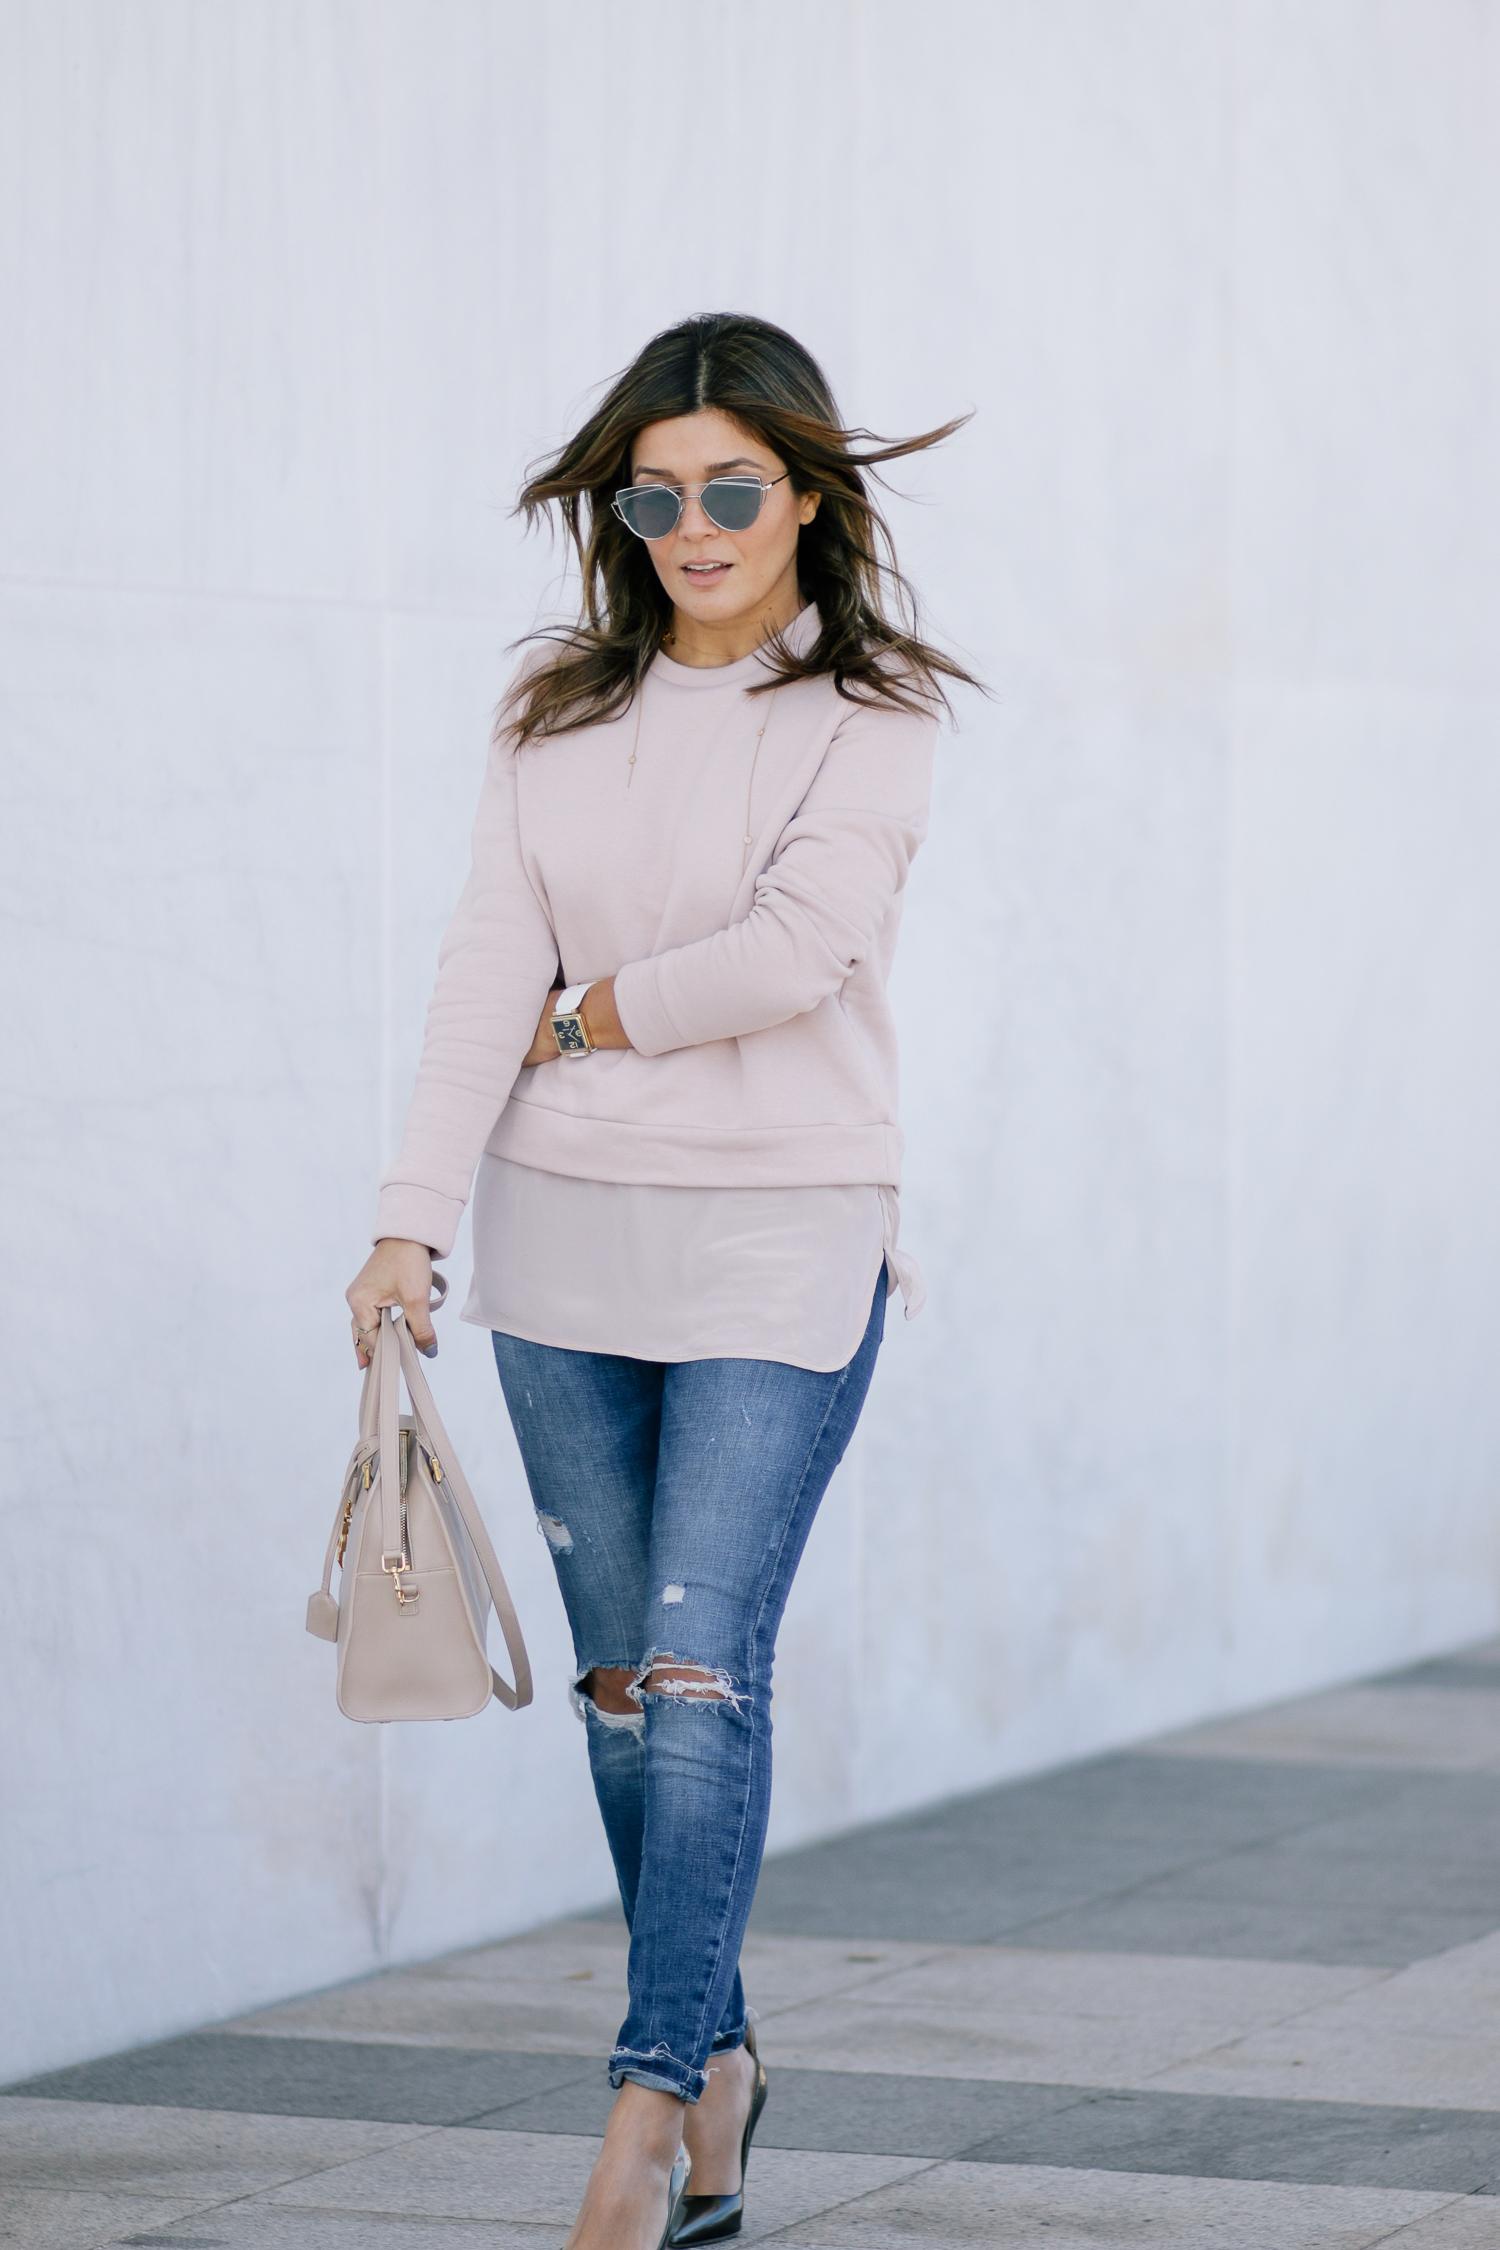 Zara Jeans and Blush Sweatshirt